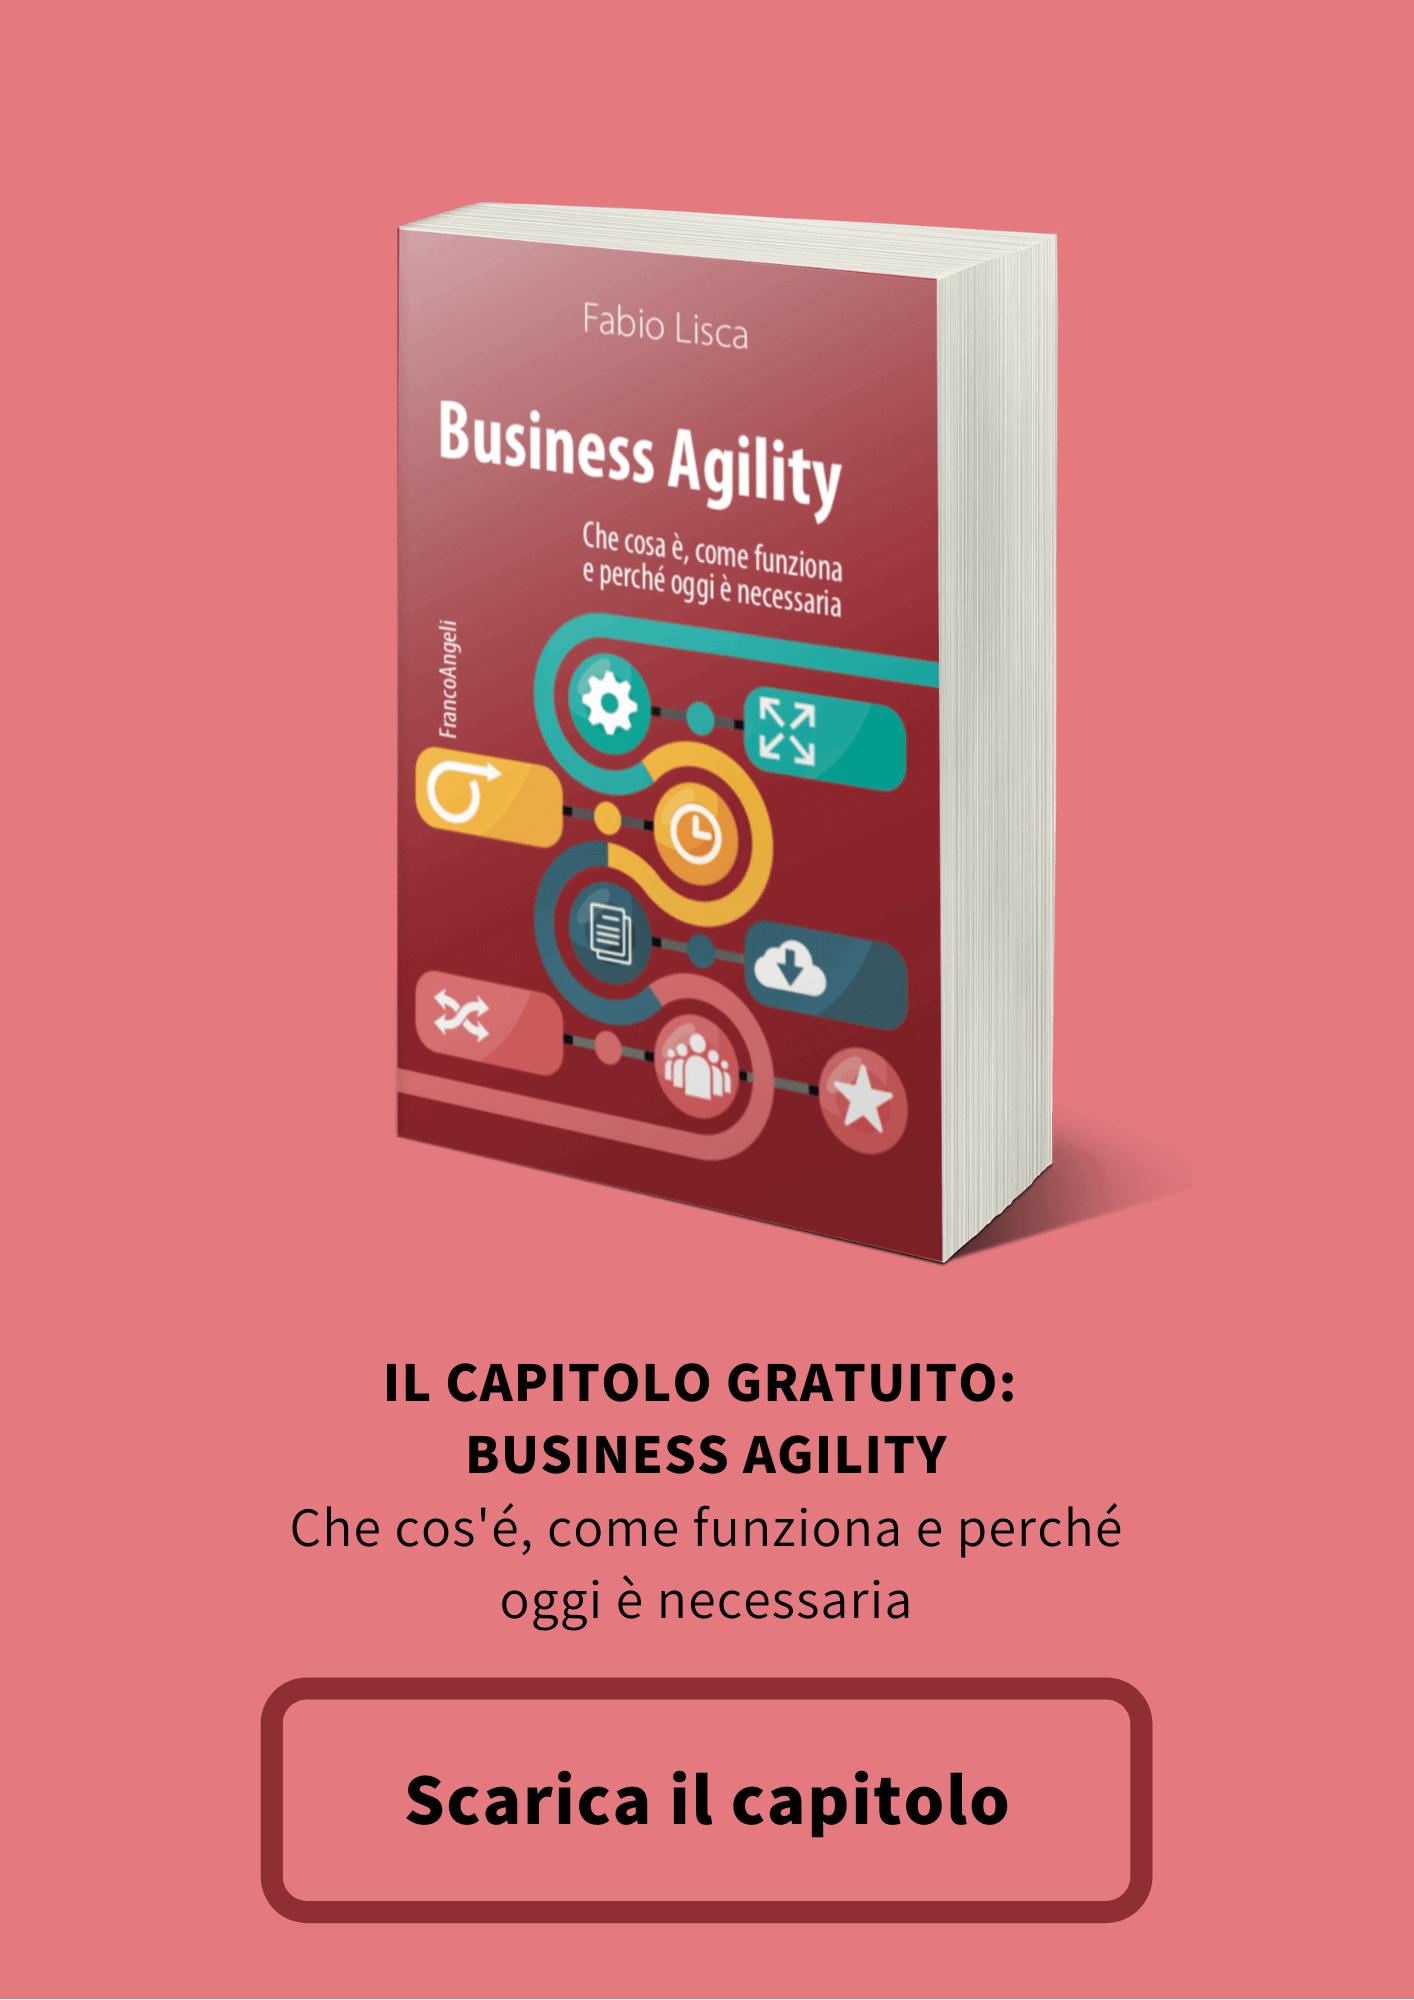 Business Agility, primo capitolo